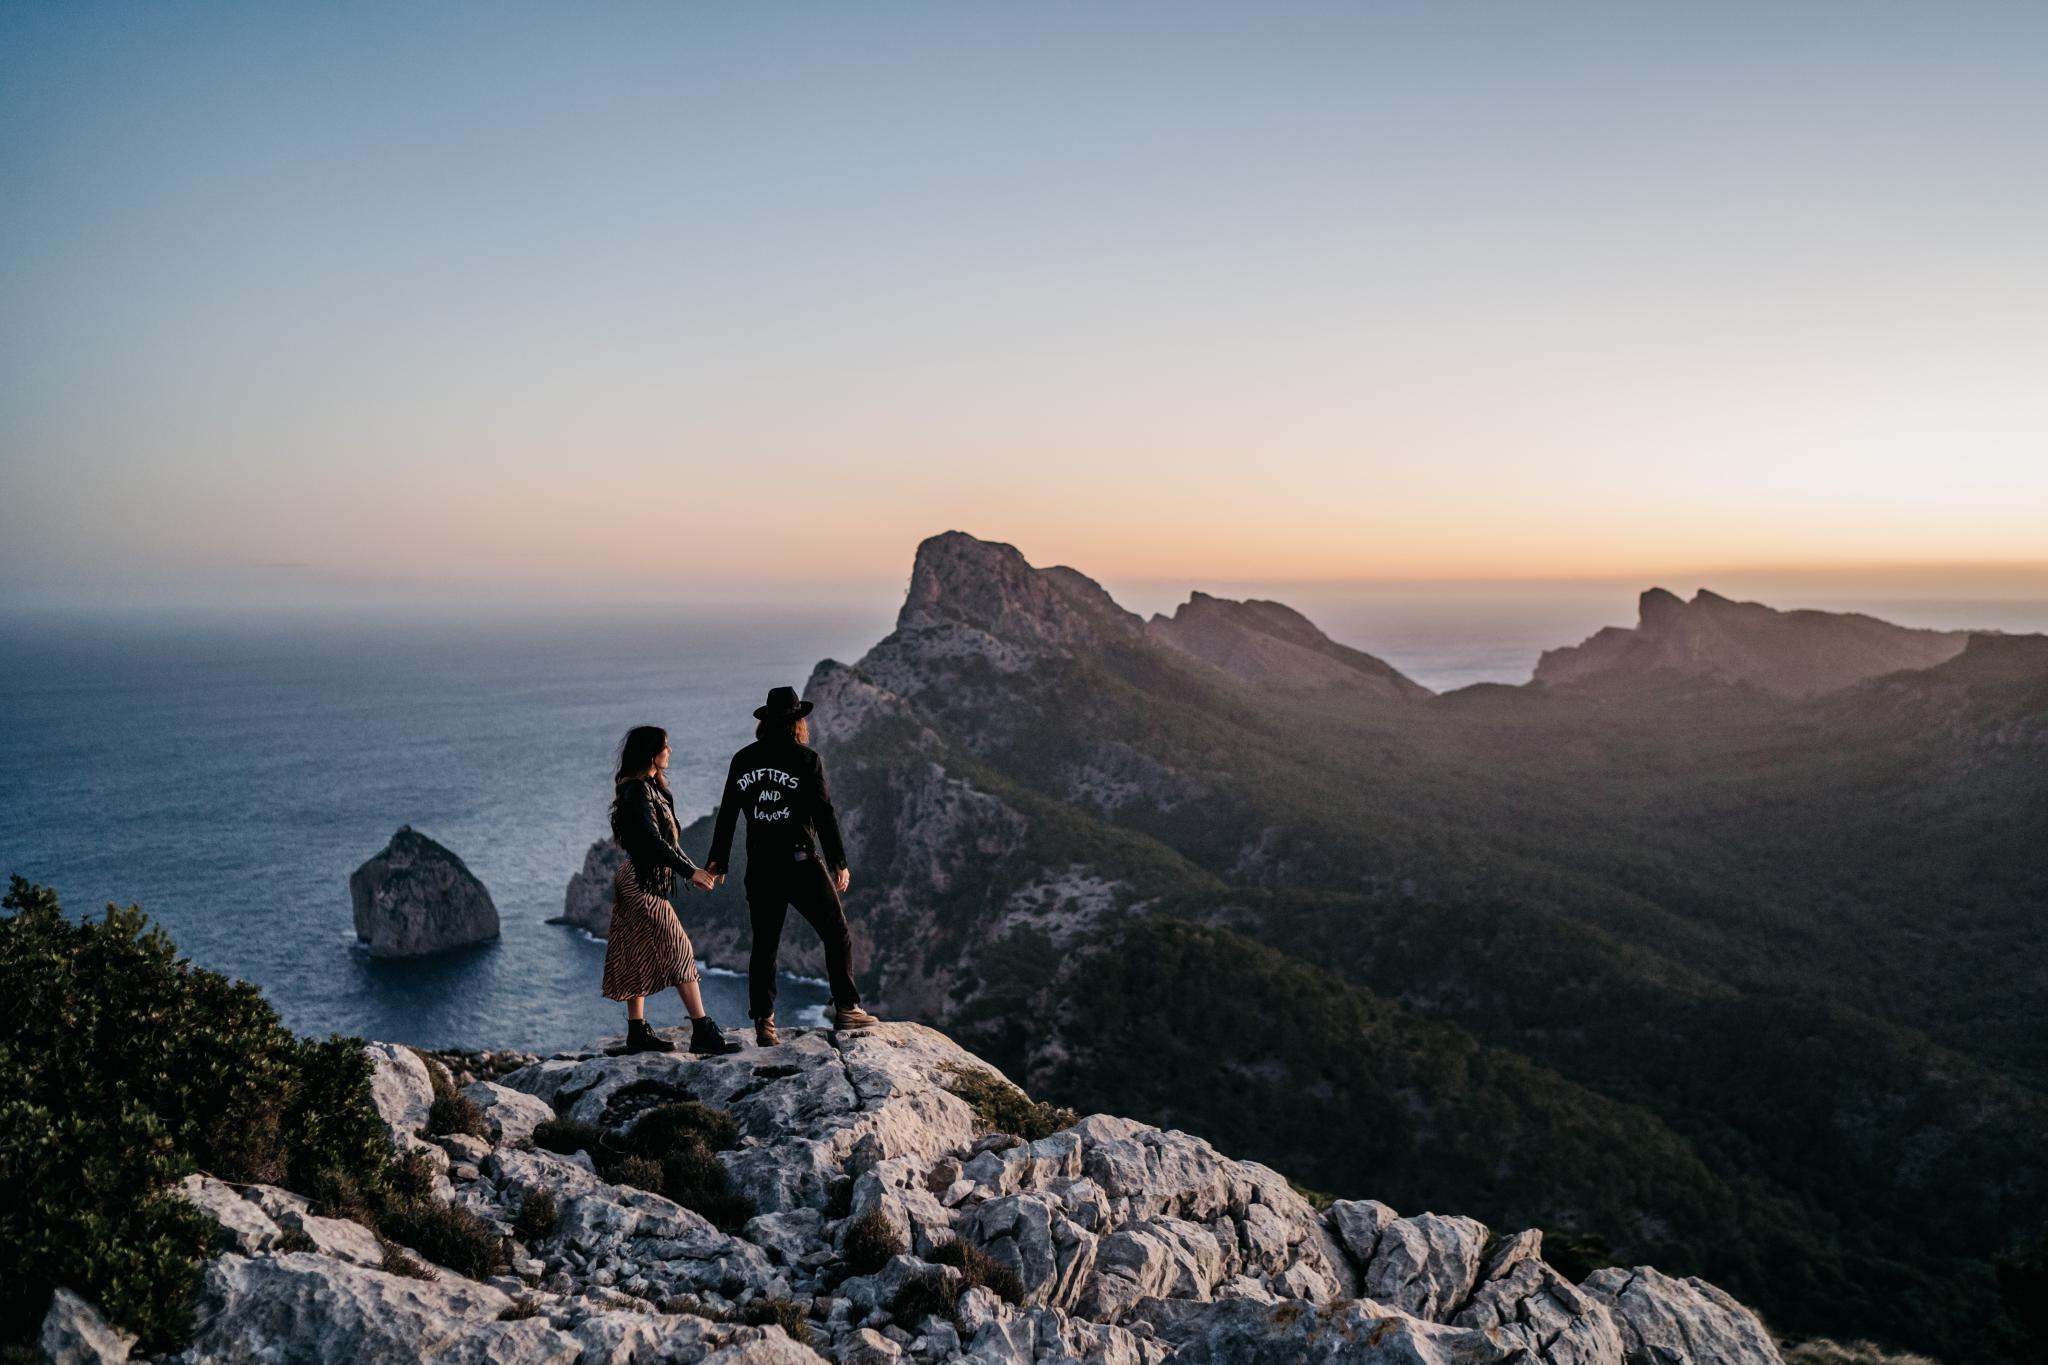 Sunrise Shoot auf Mallorca Cap de Formentor